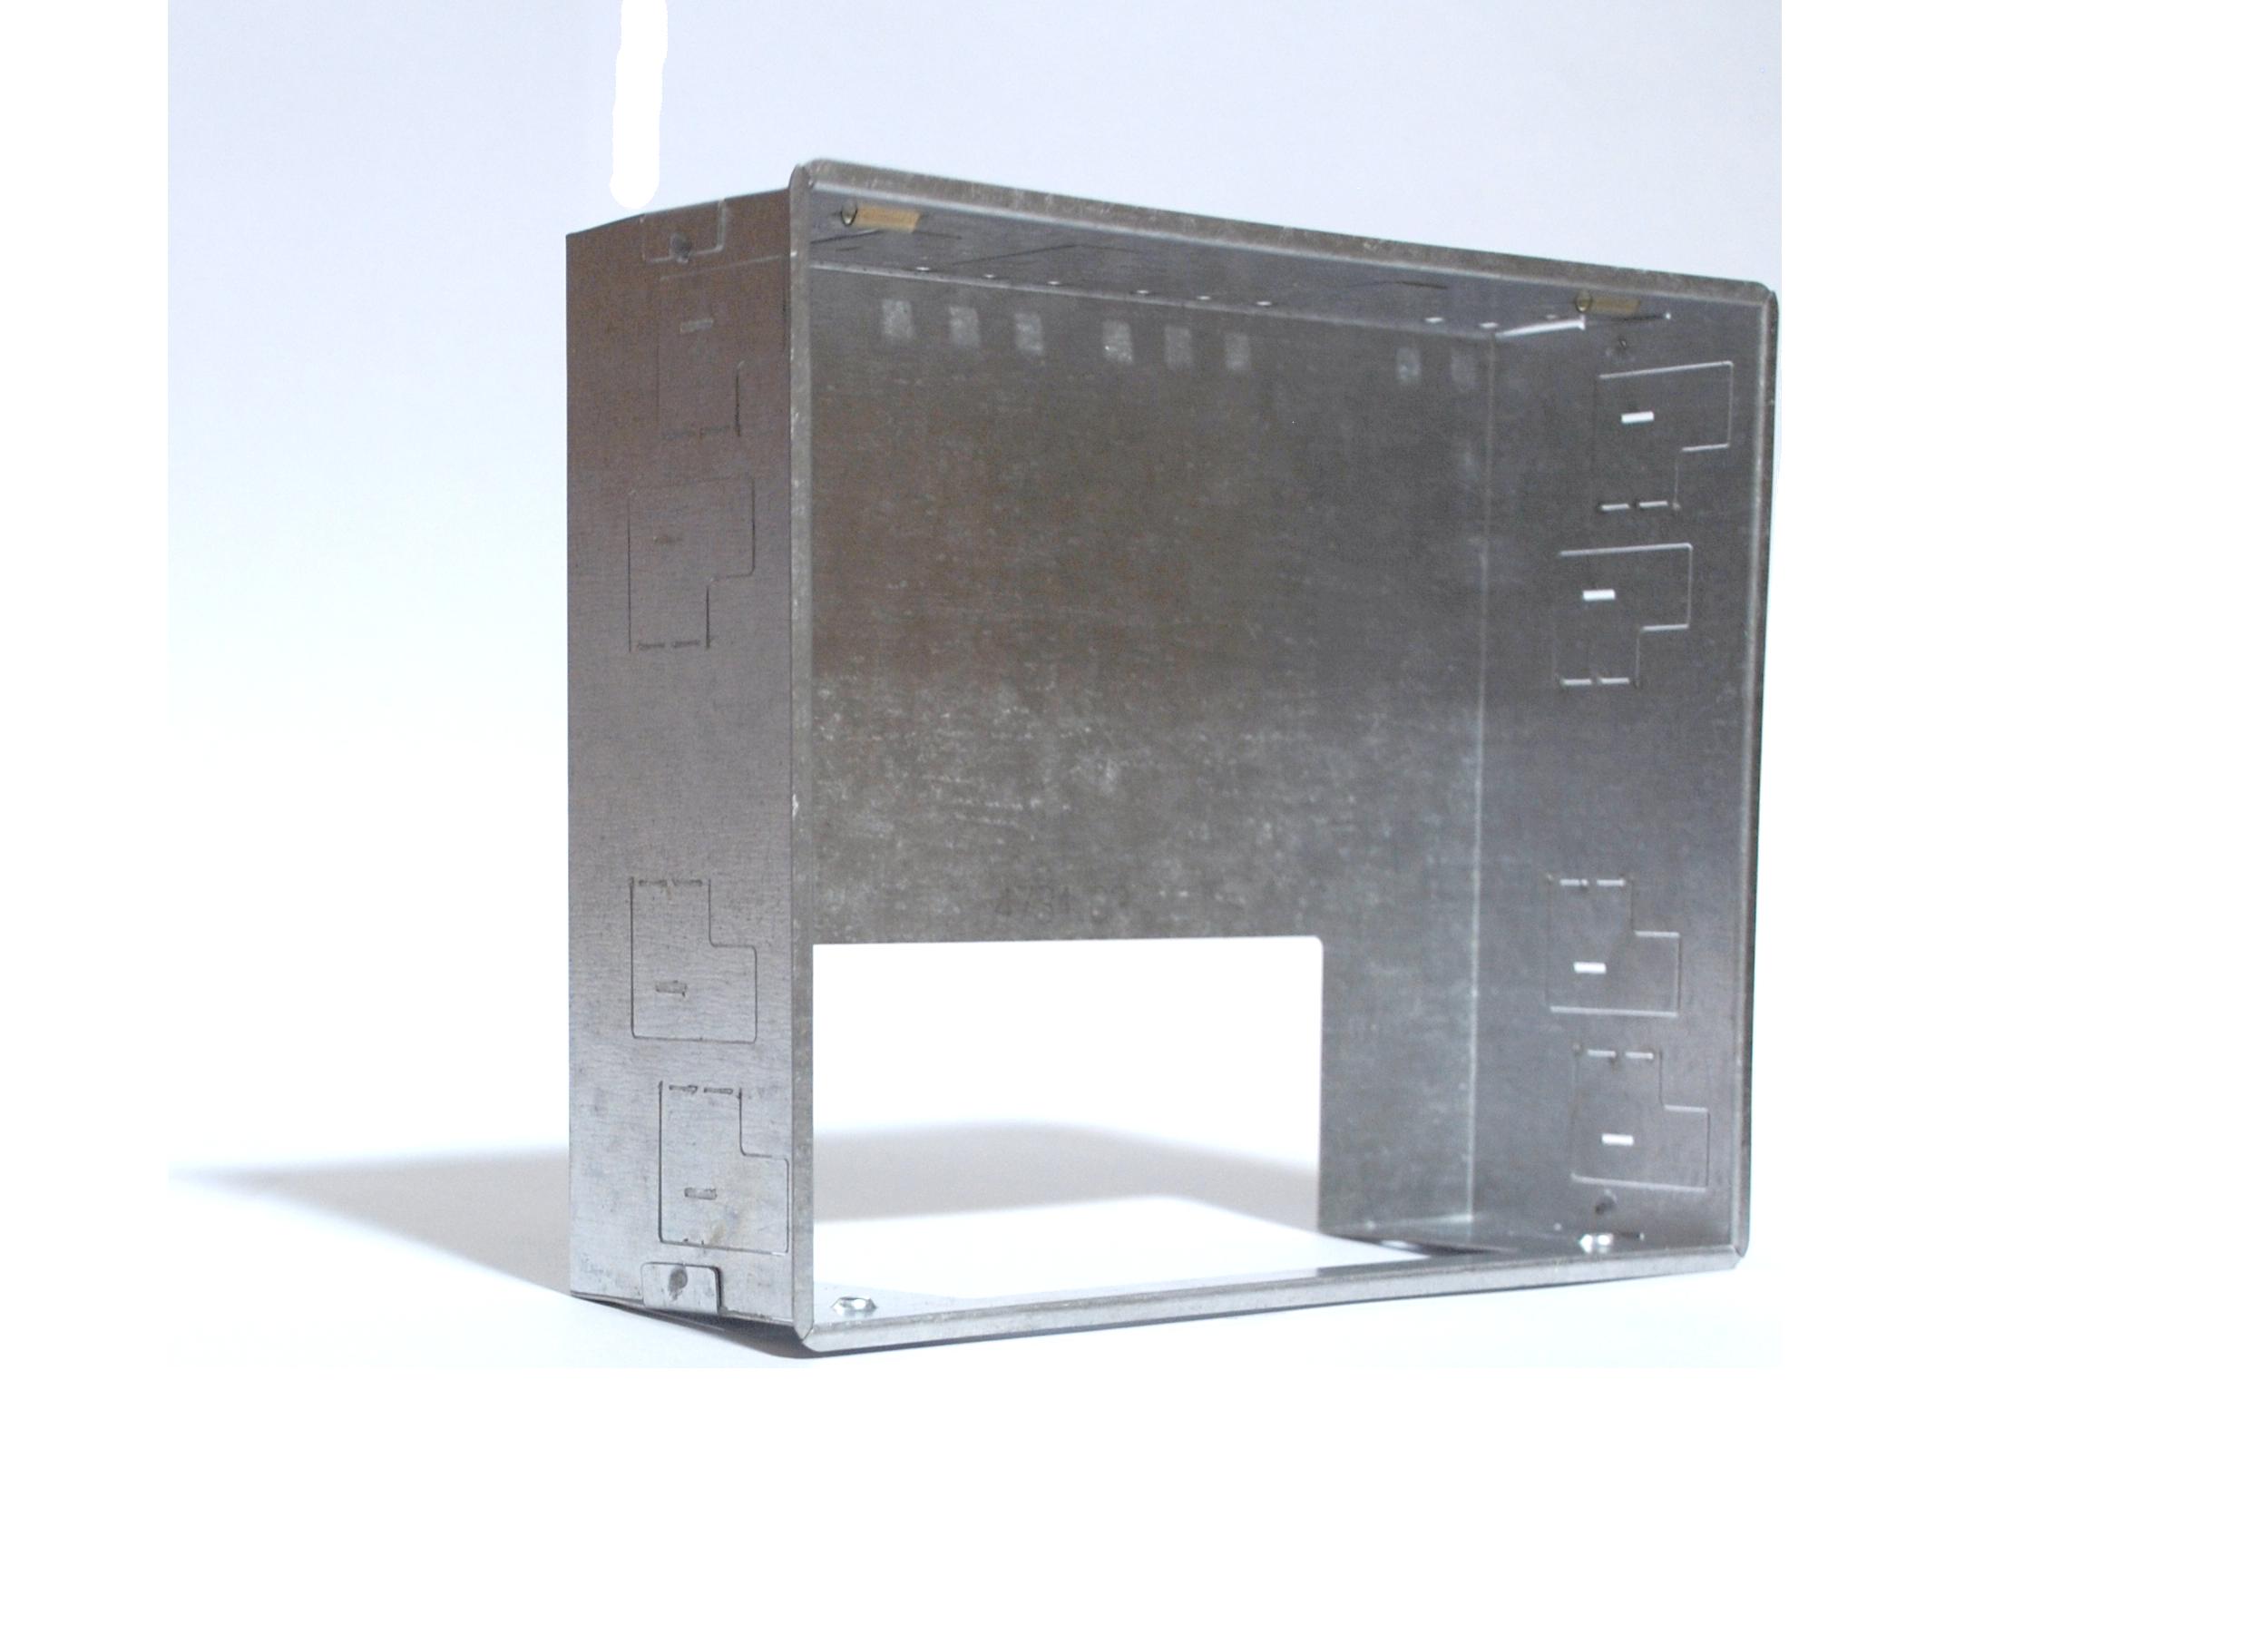 BOX07-01 WALL MOUNT BOX FOR eSMART07